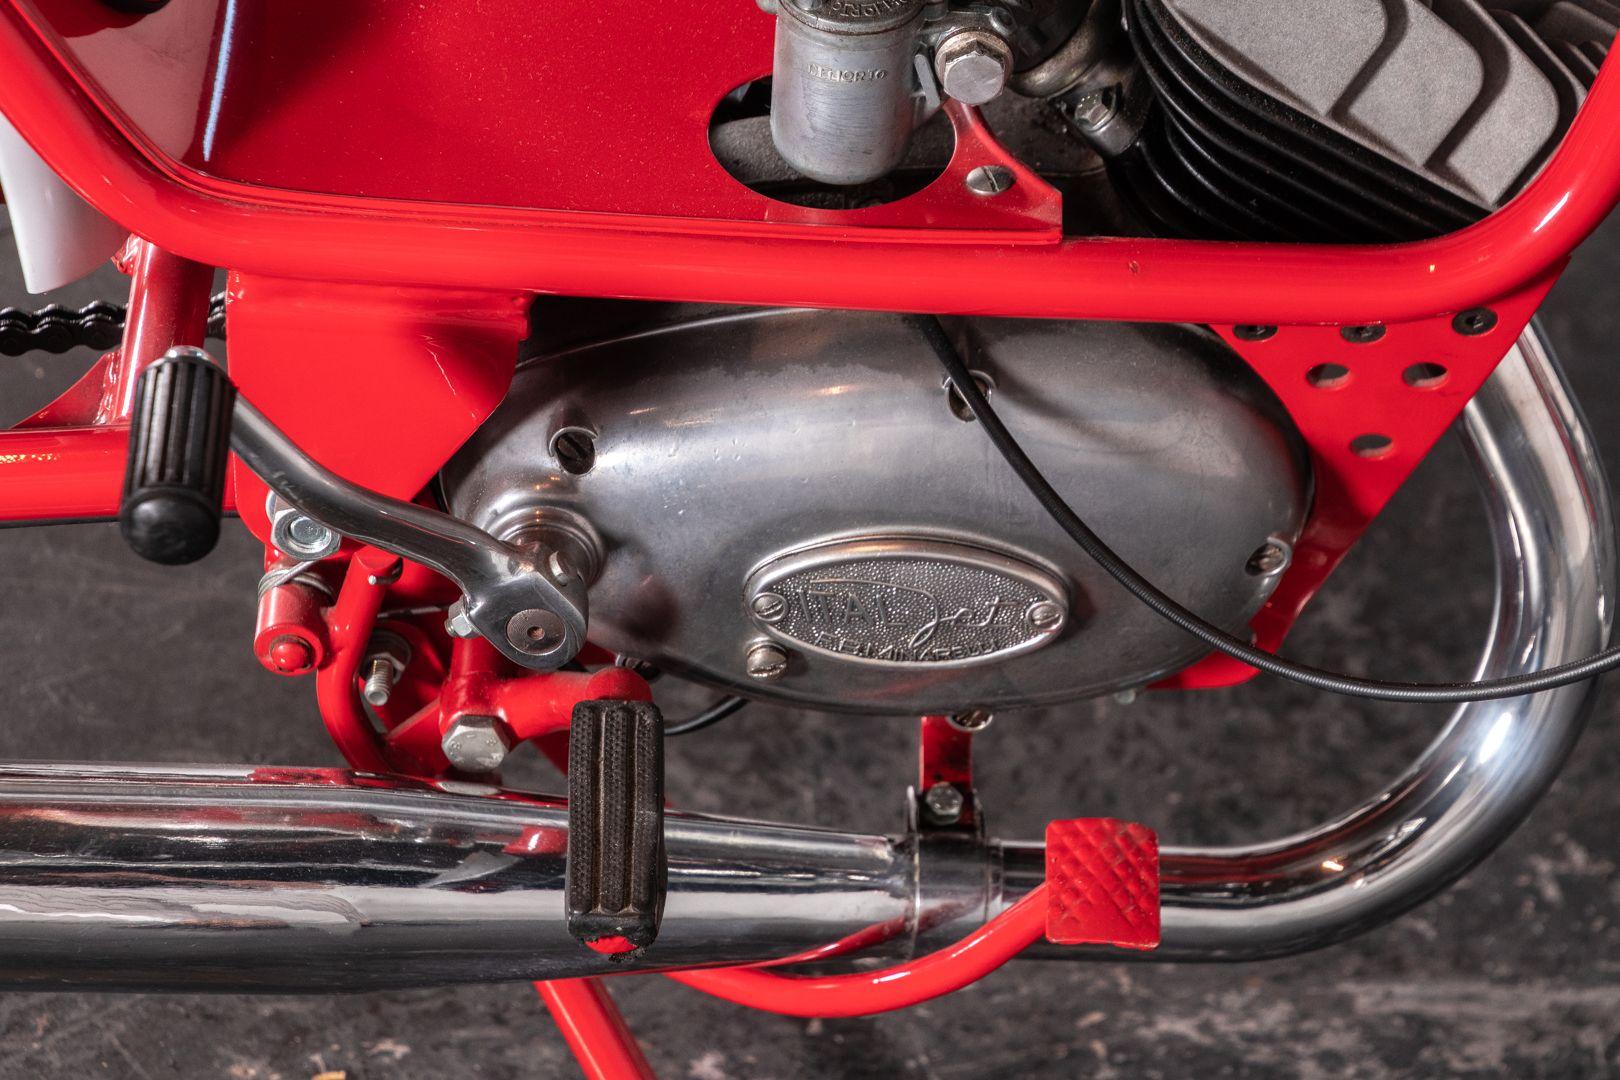 1971 ITALJET M-VE 48744